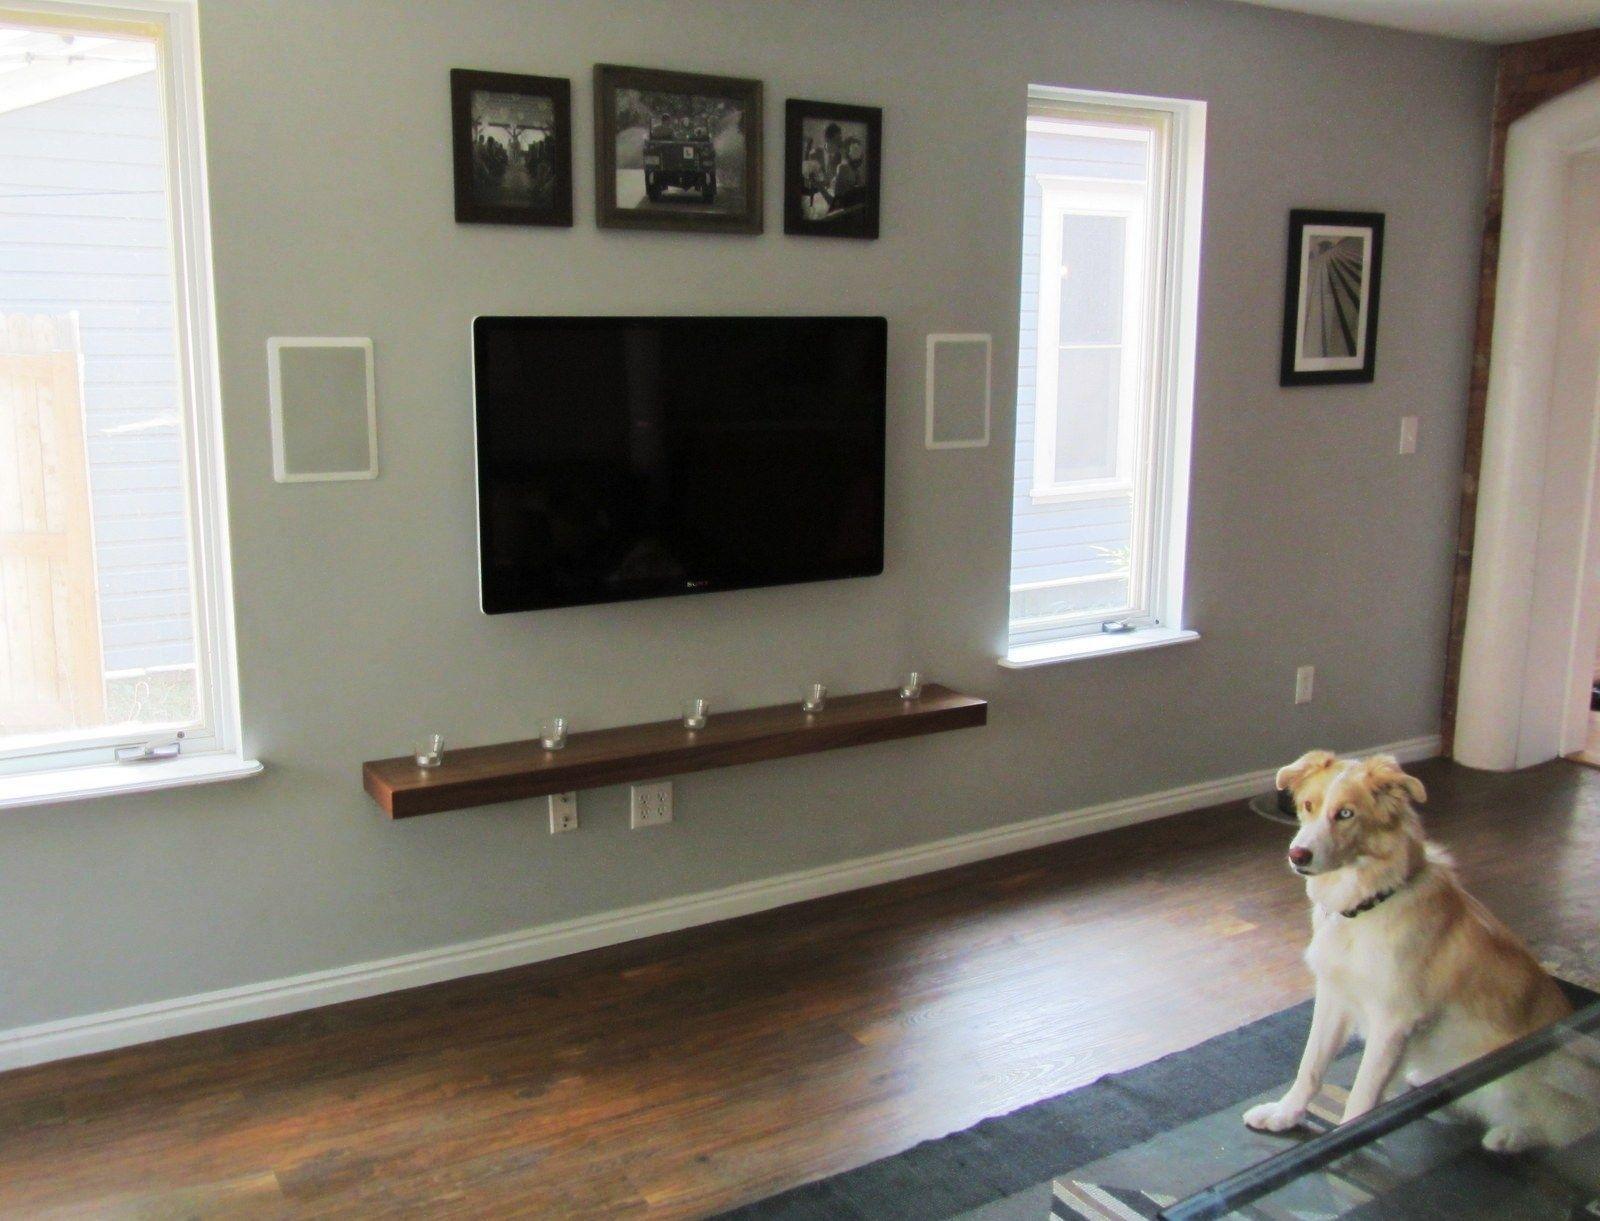 tv wall mount ideas hide wires - Motorisierte Tvhalterung Unter Dem Bett